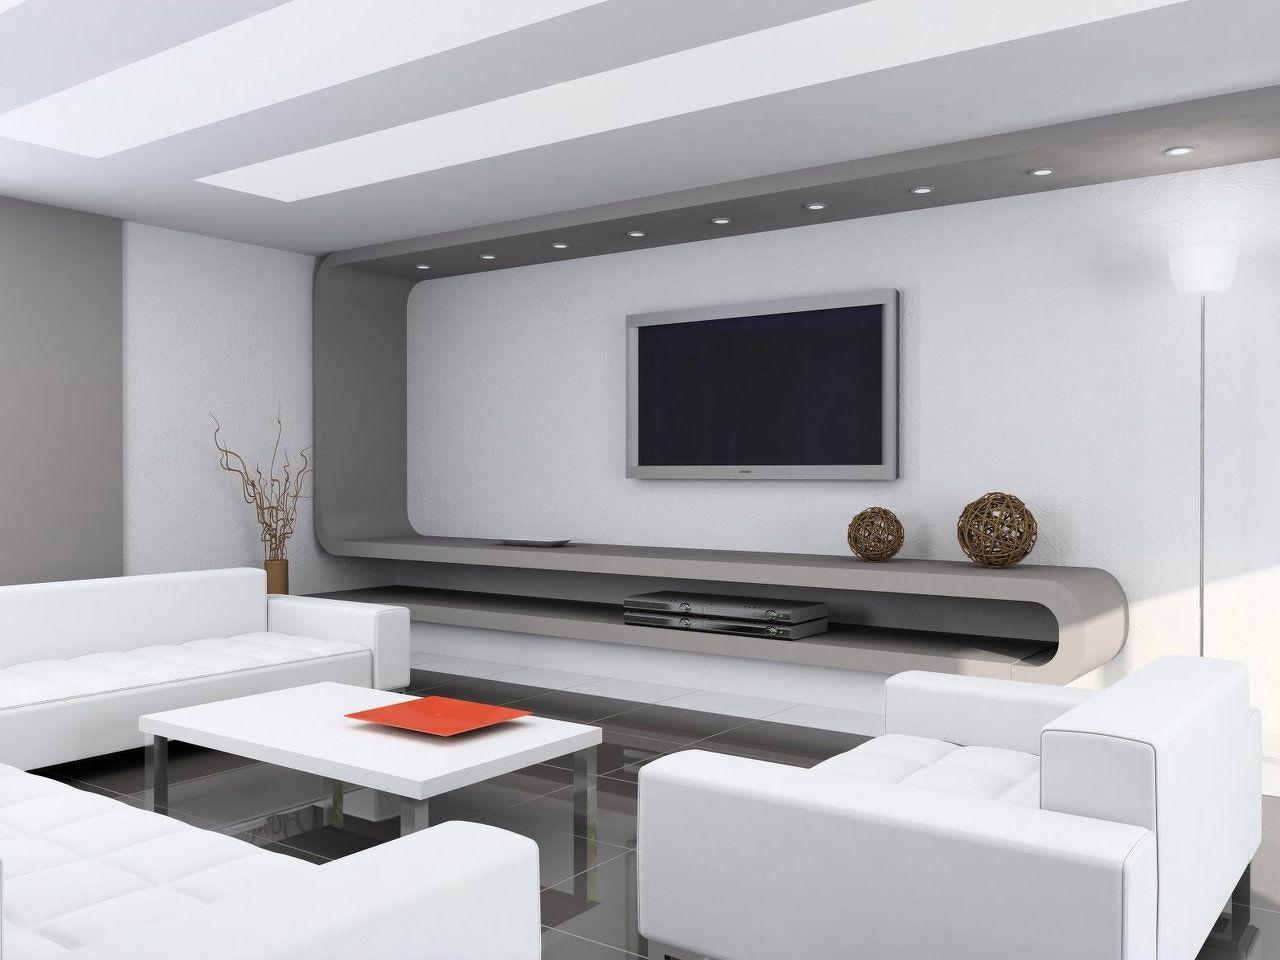 Interne Home Design #Badezimmer #Büromöbel #Couchtisch #Deko ideen ...